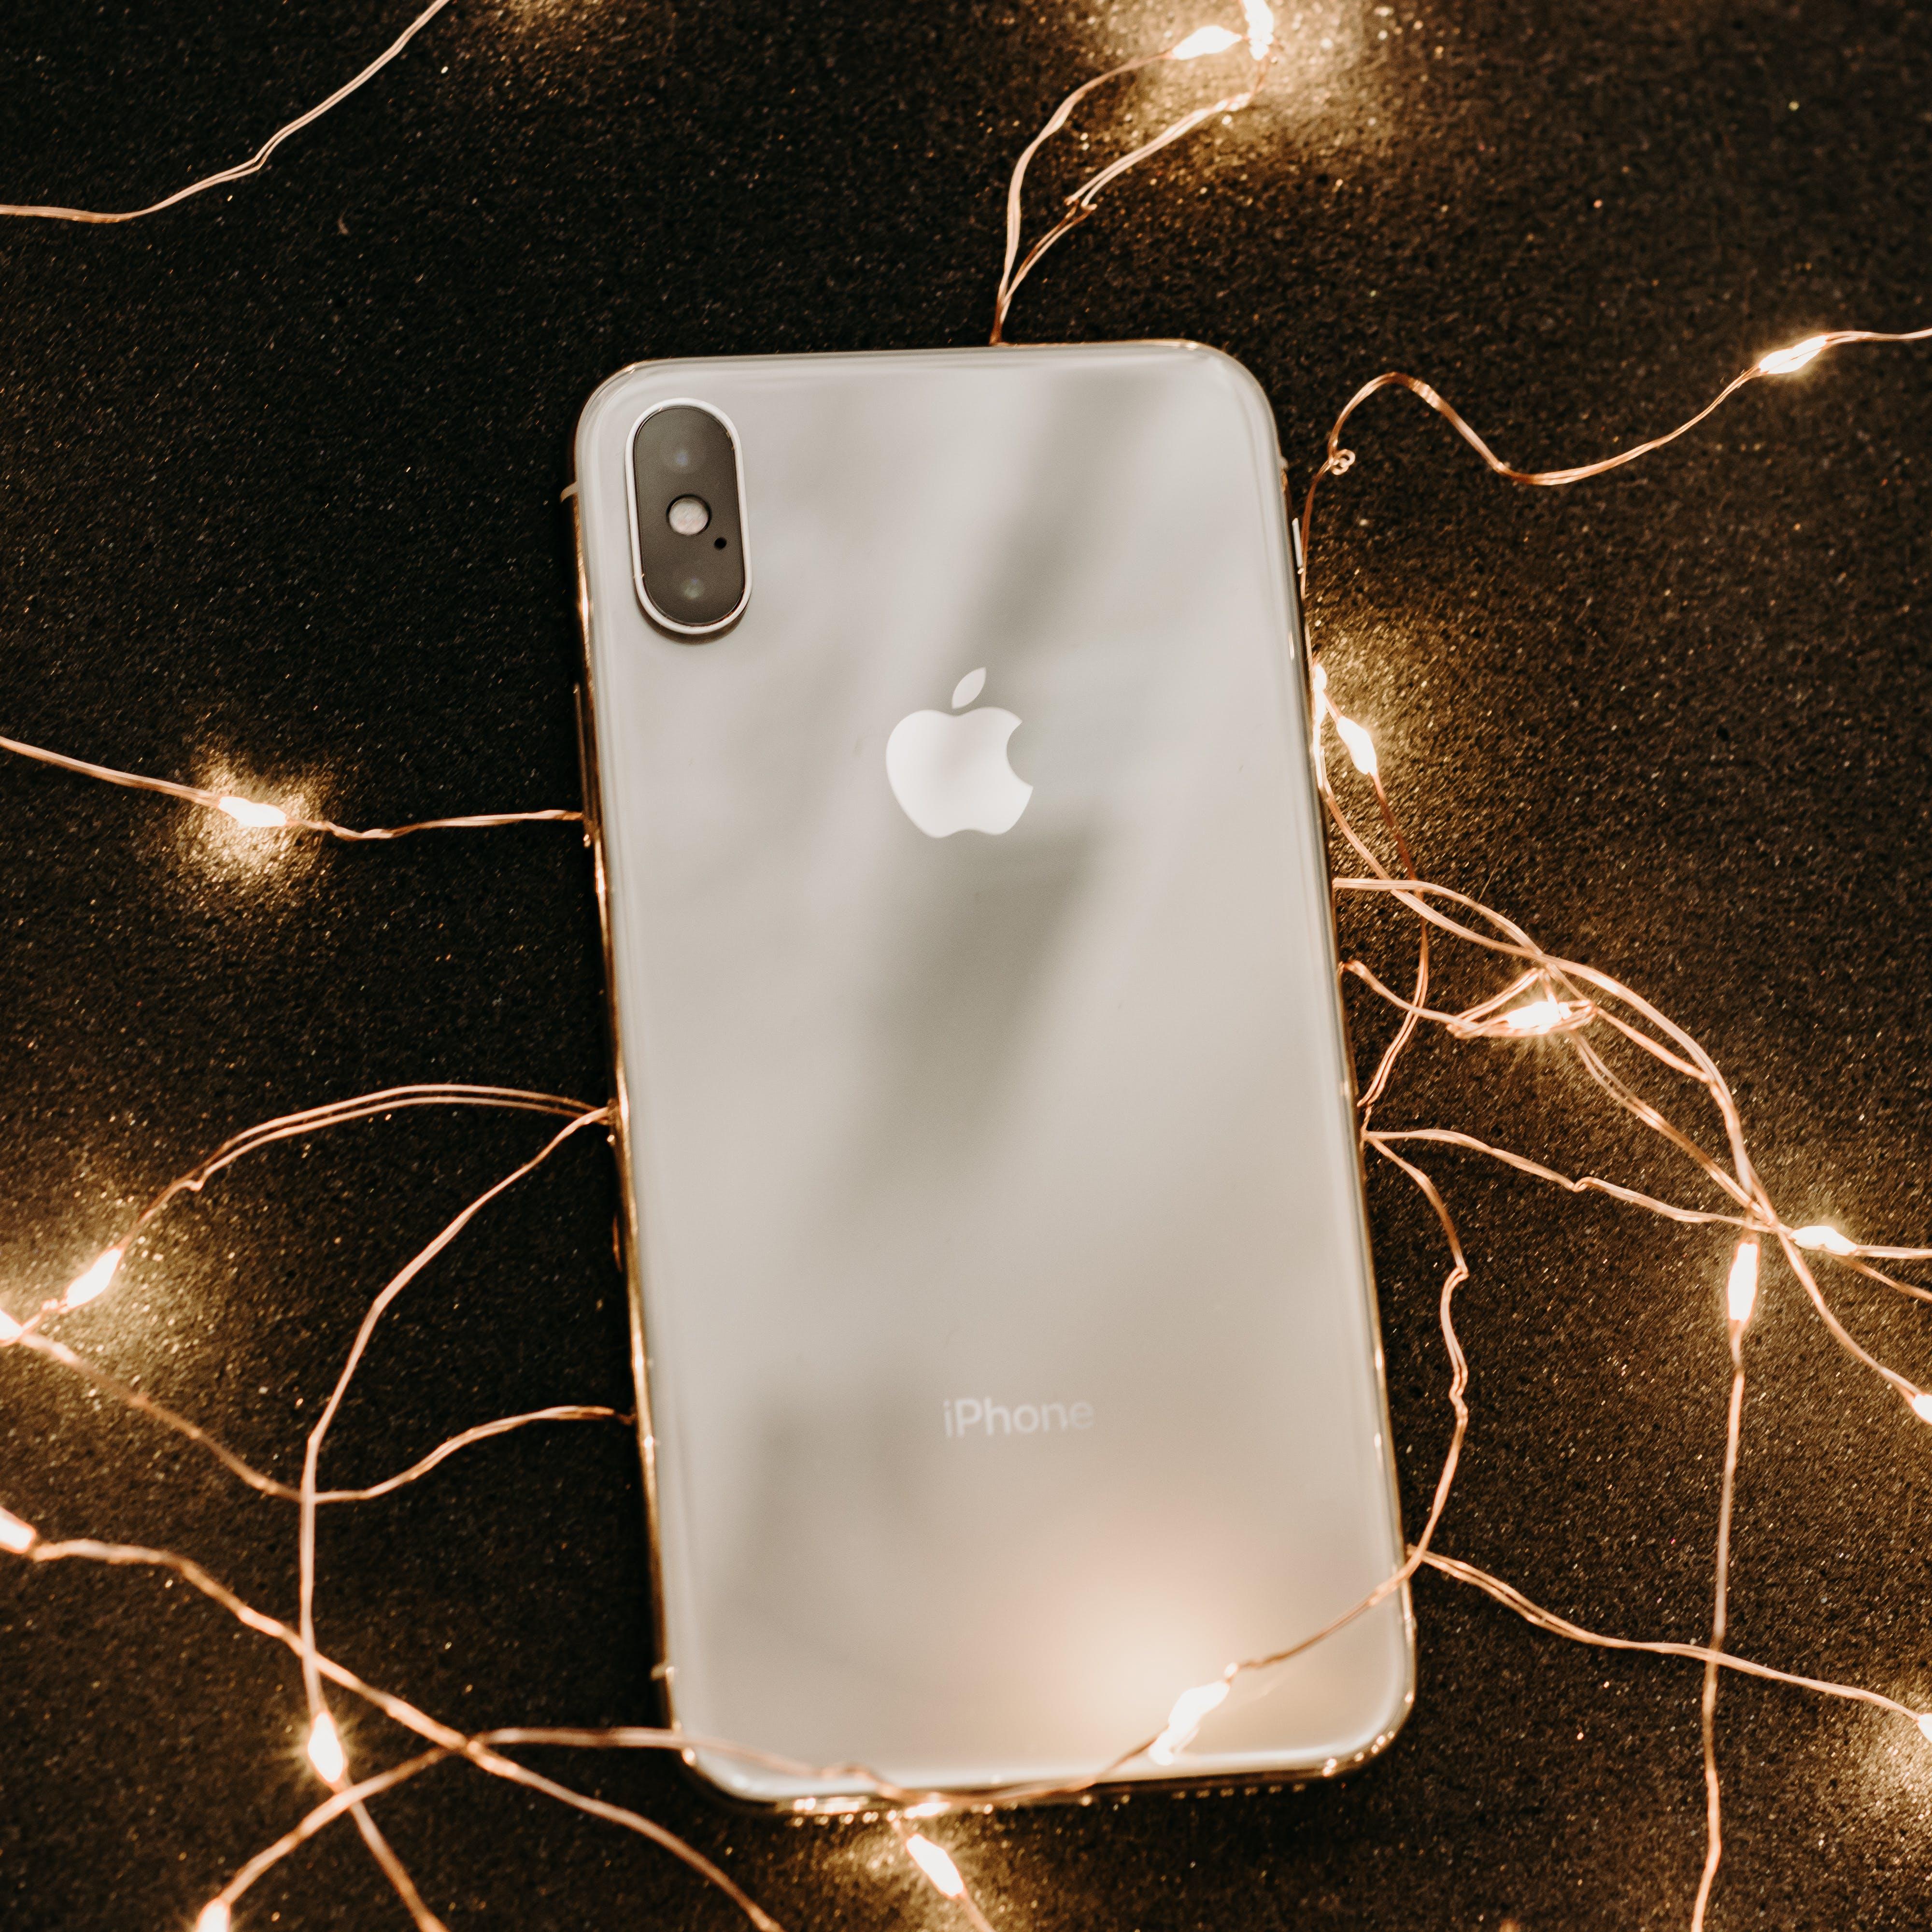 Gratis stockfoto met apple, camera, close-up, communicatie